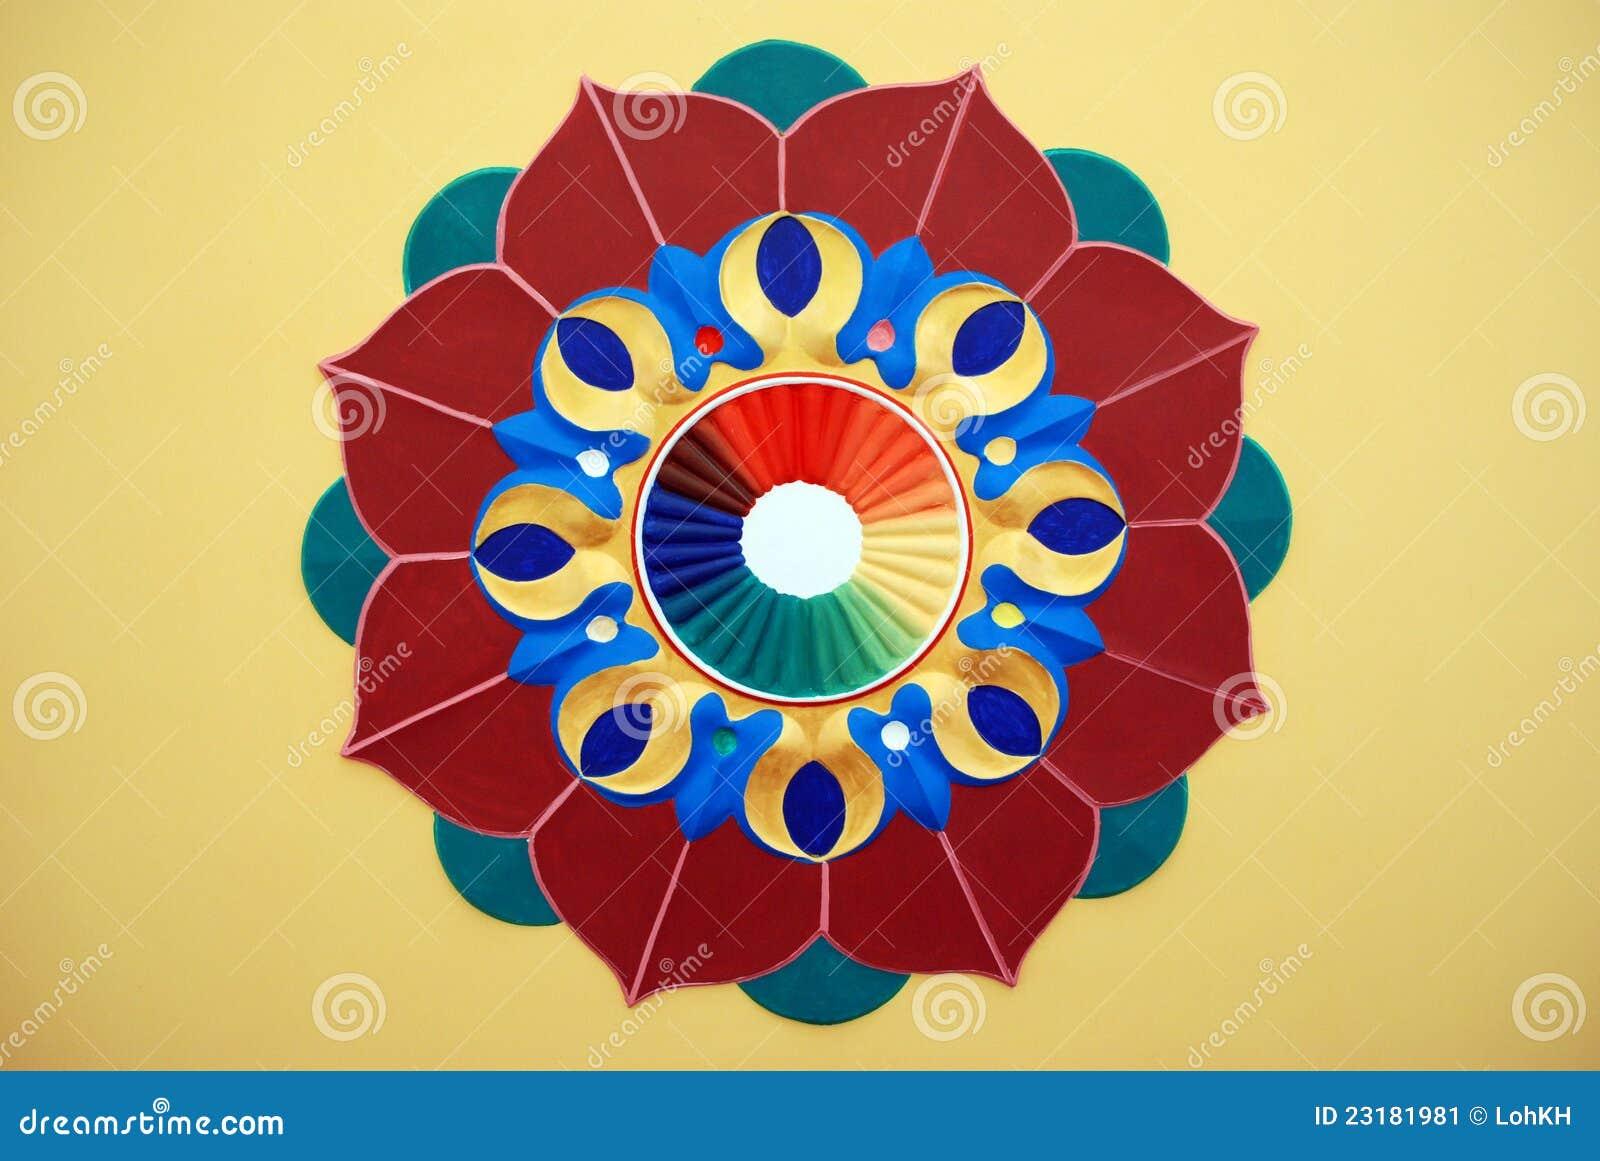 Graphic design of lotus flower stock illustration illustration of graphic design of lotus flower izmirmasajfo